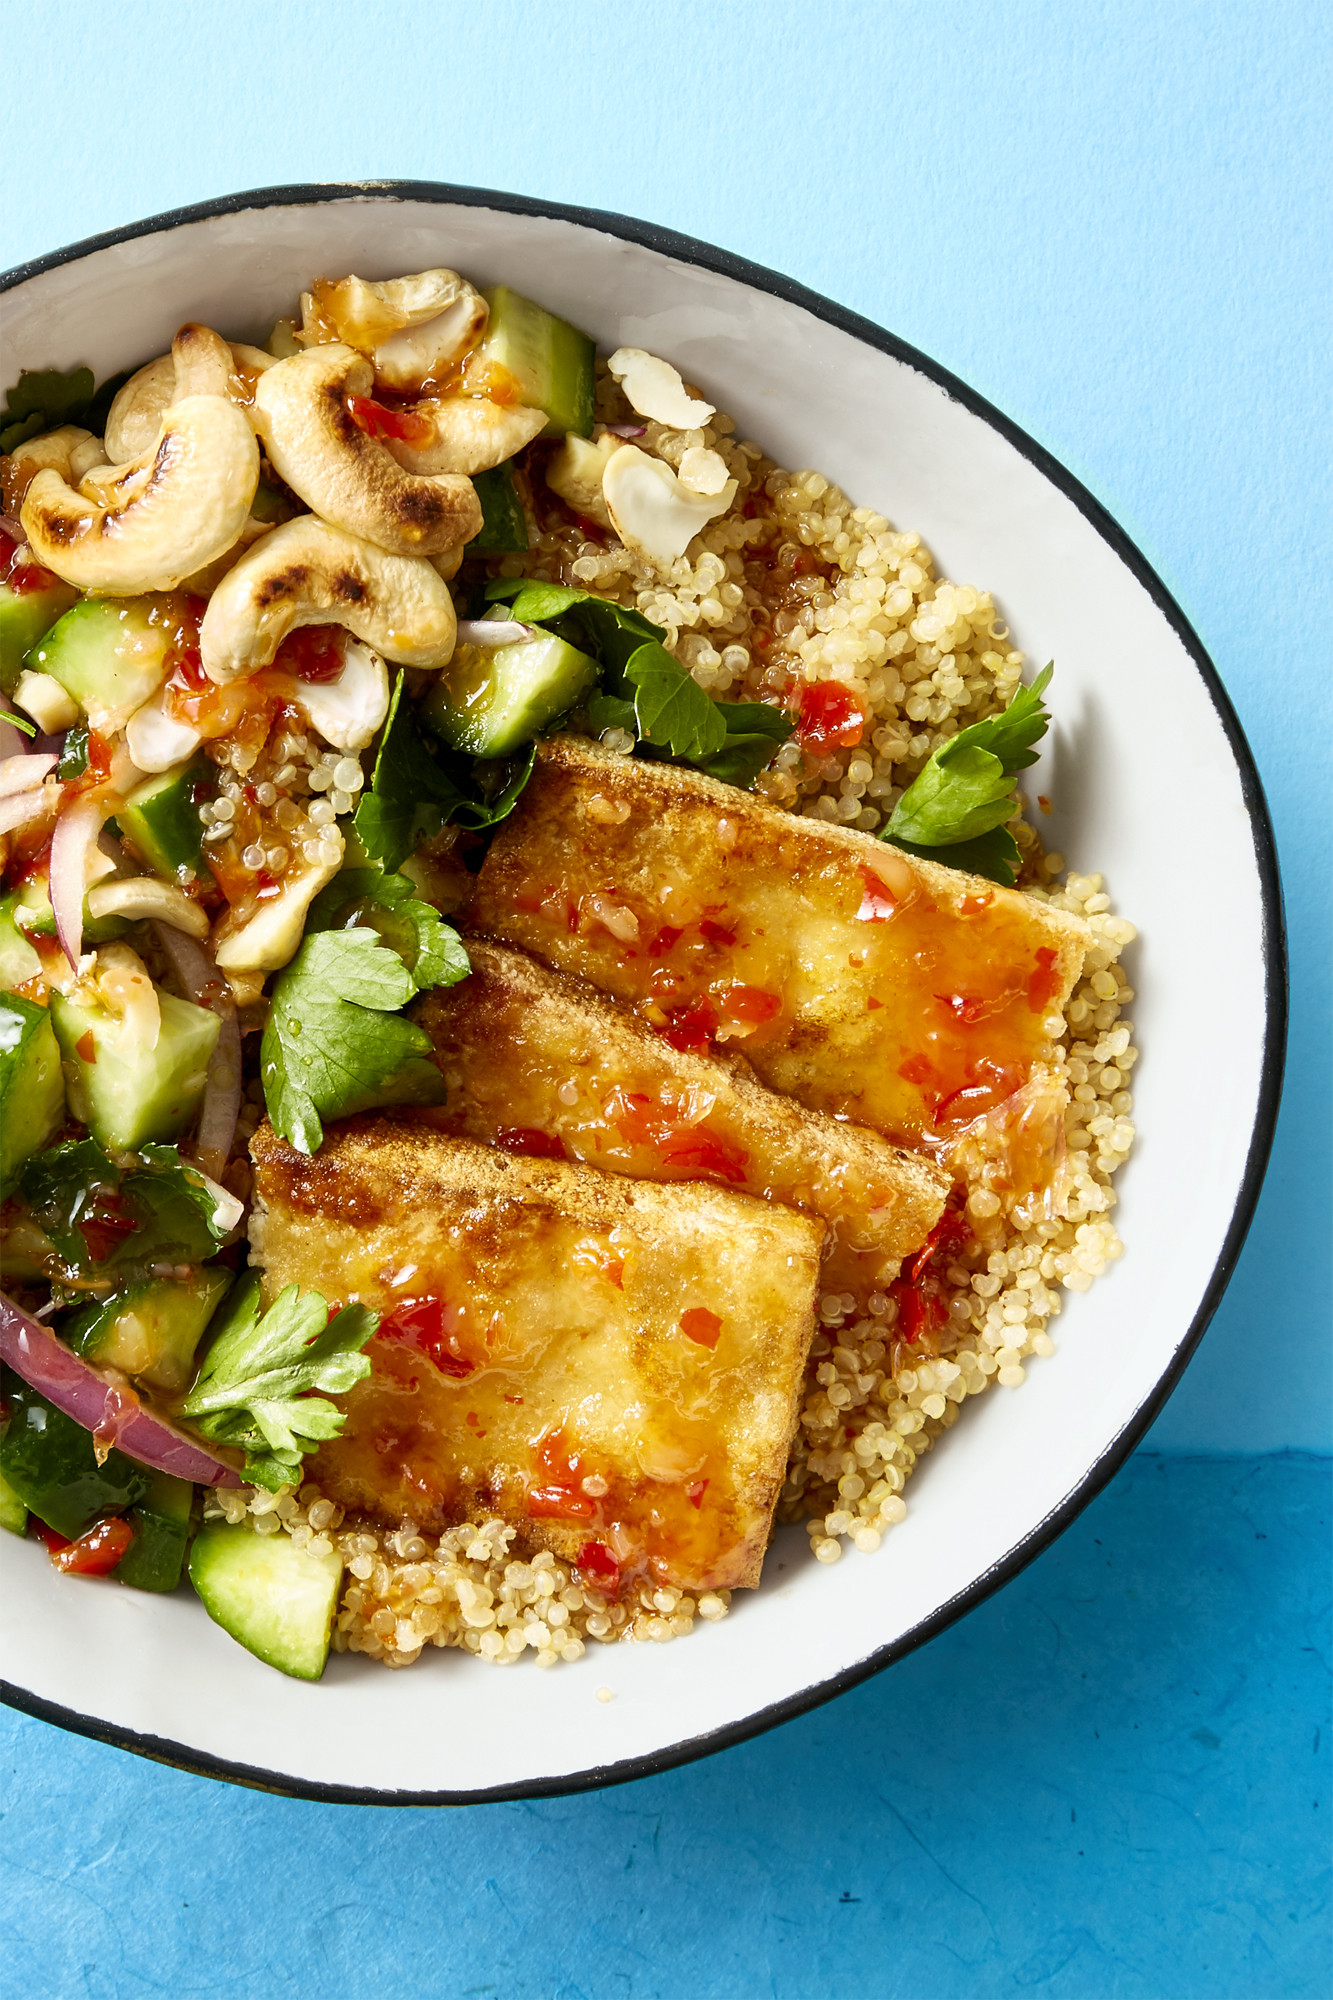 Delicious Tofu Recipes  Best Crispy Tofu Bowl Recipe How to Make Crispy Tofu Bowl